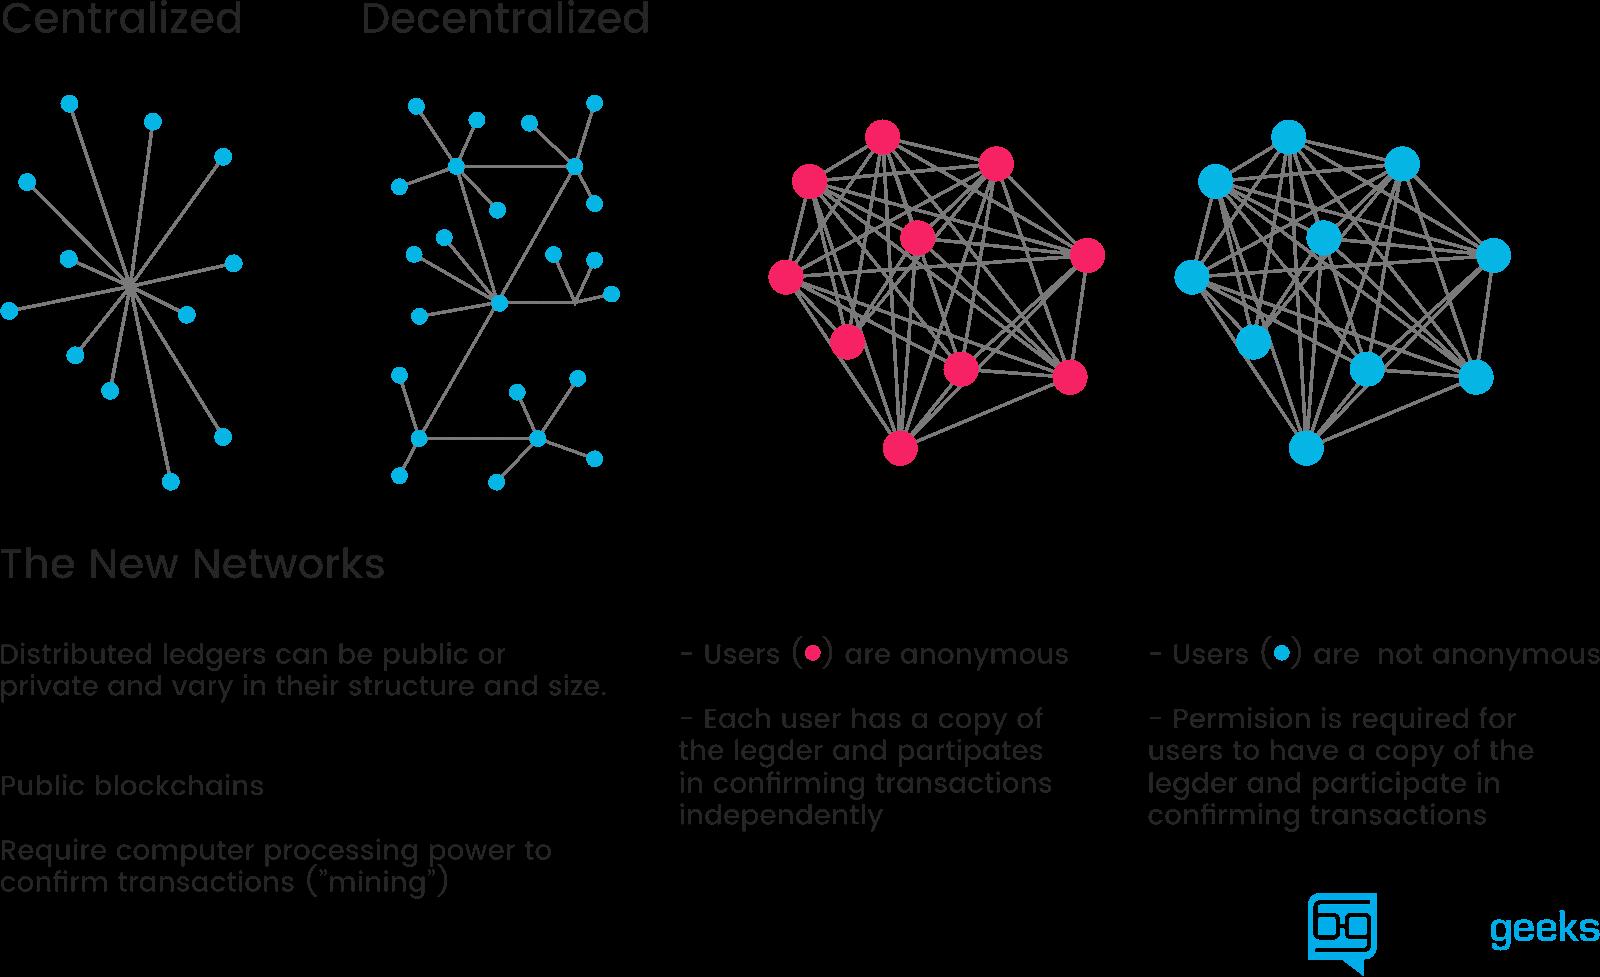 Figure 2. Blockgeeks Illustration of the Different Network Types.